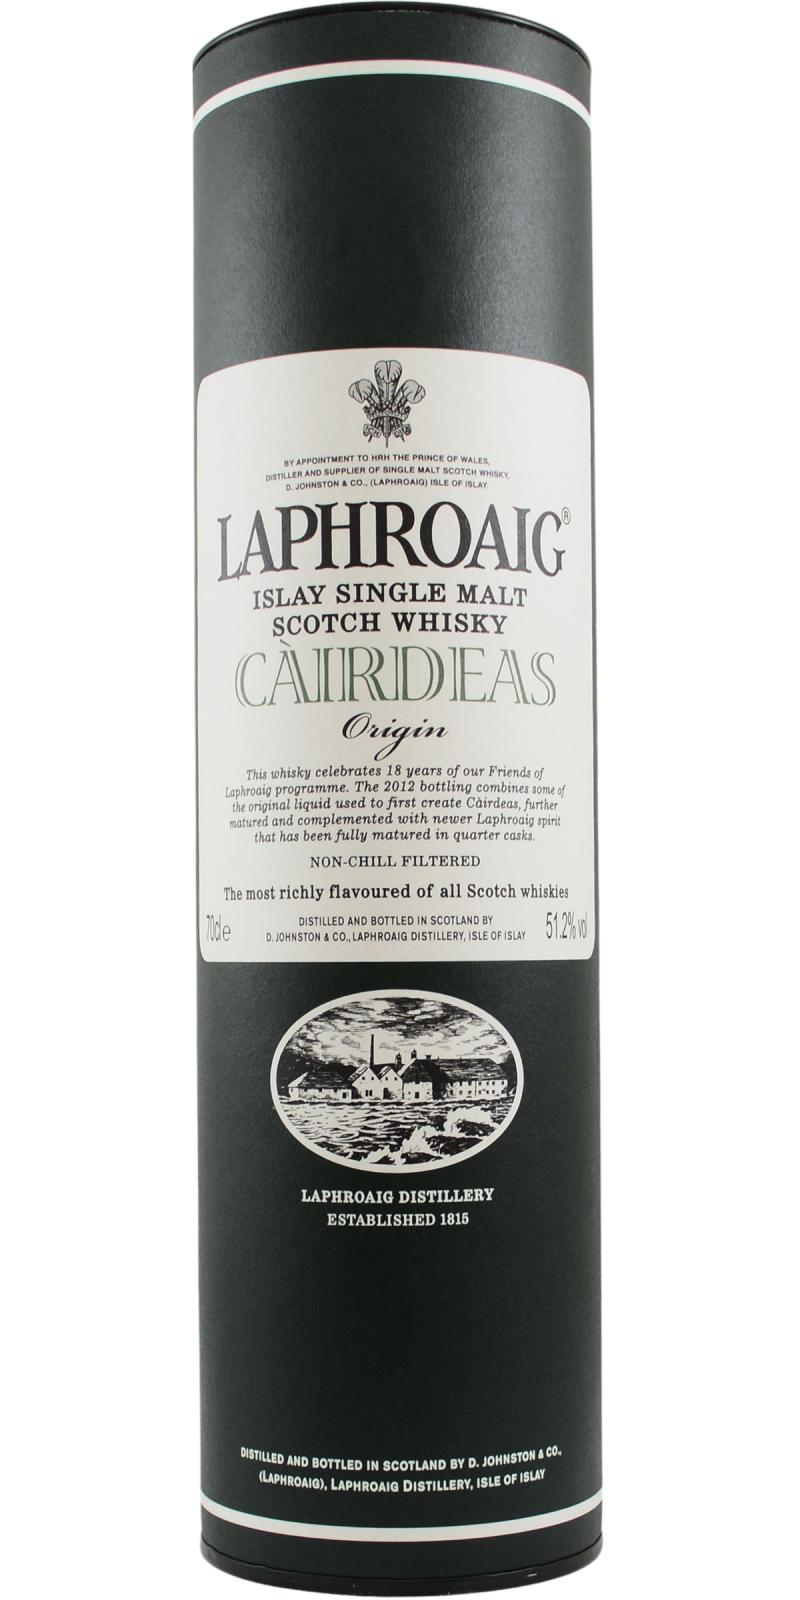 Laphroaig Cairdeas